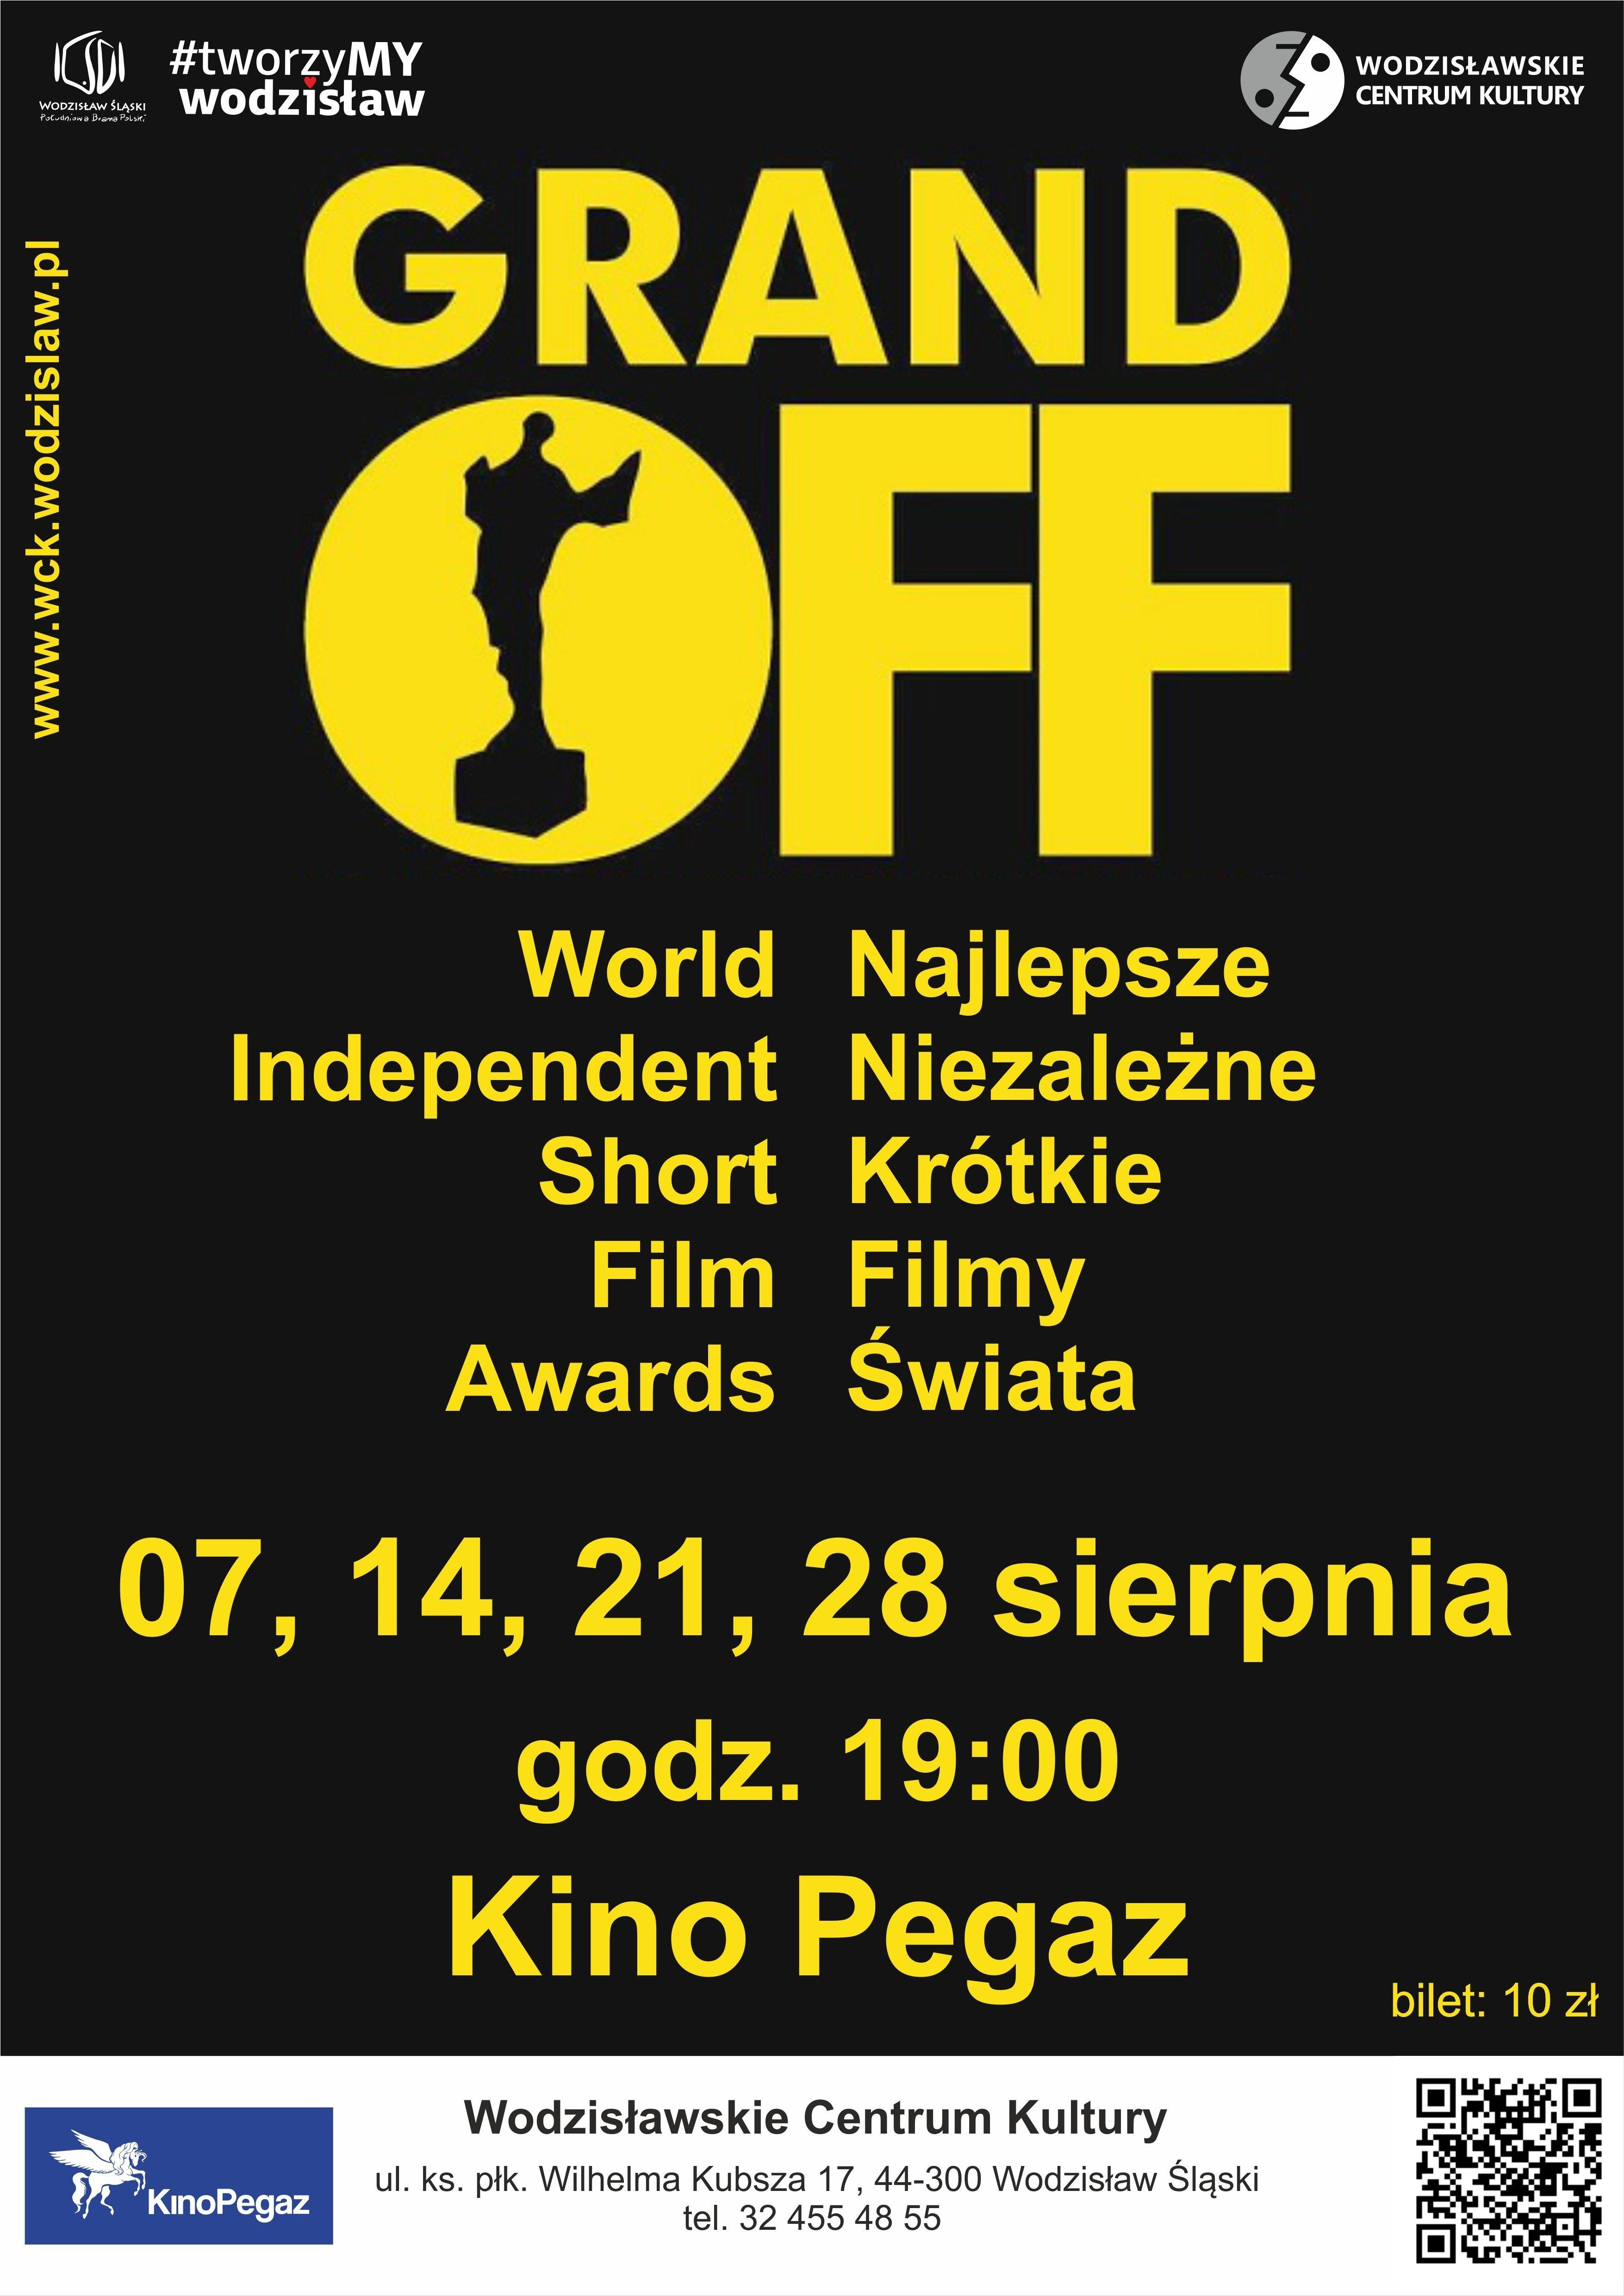 Grand OFF Festiwal (źródło: materiały prasowe organizatora)